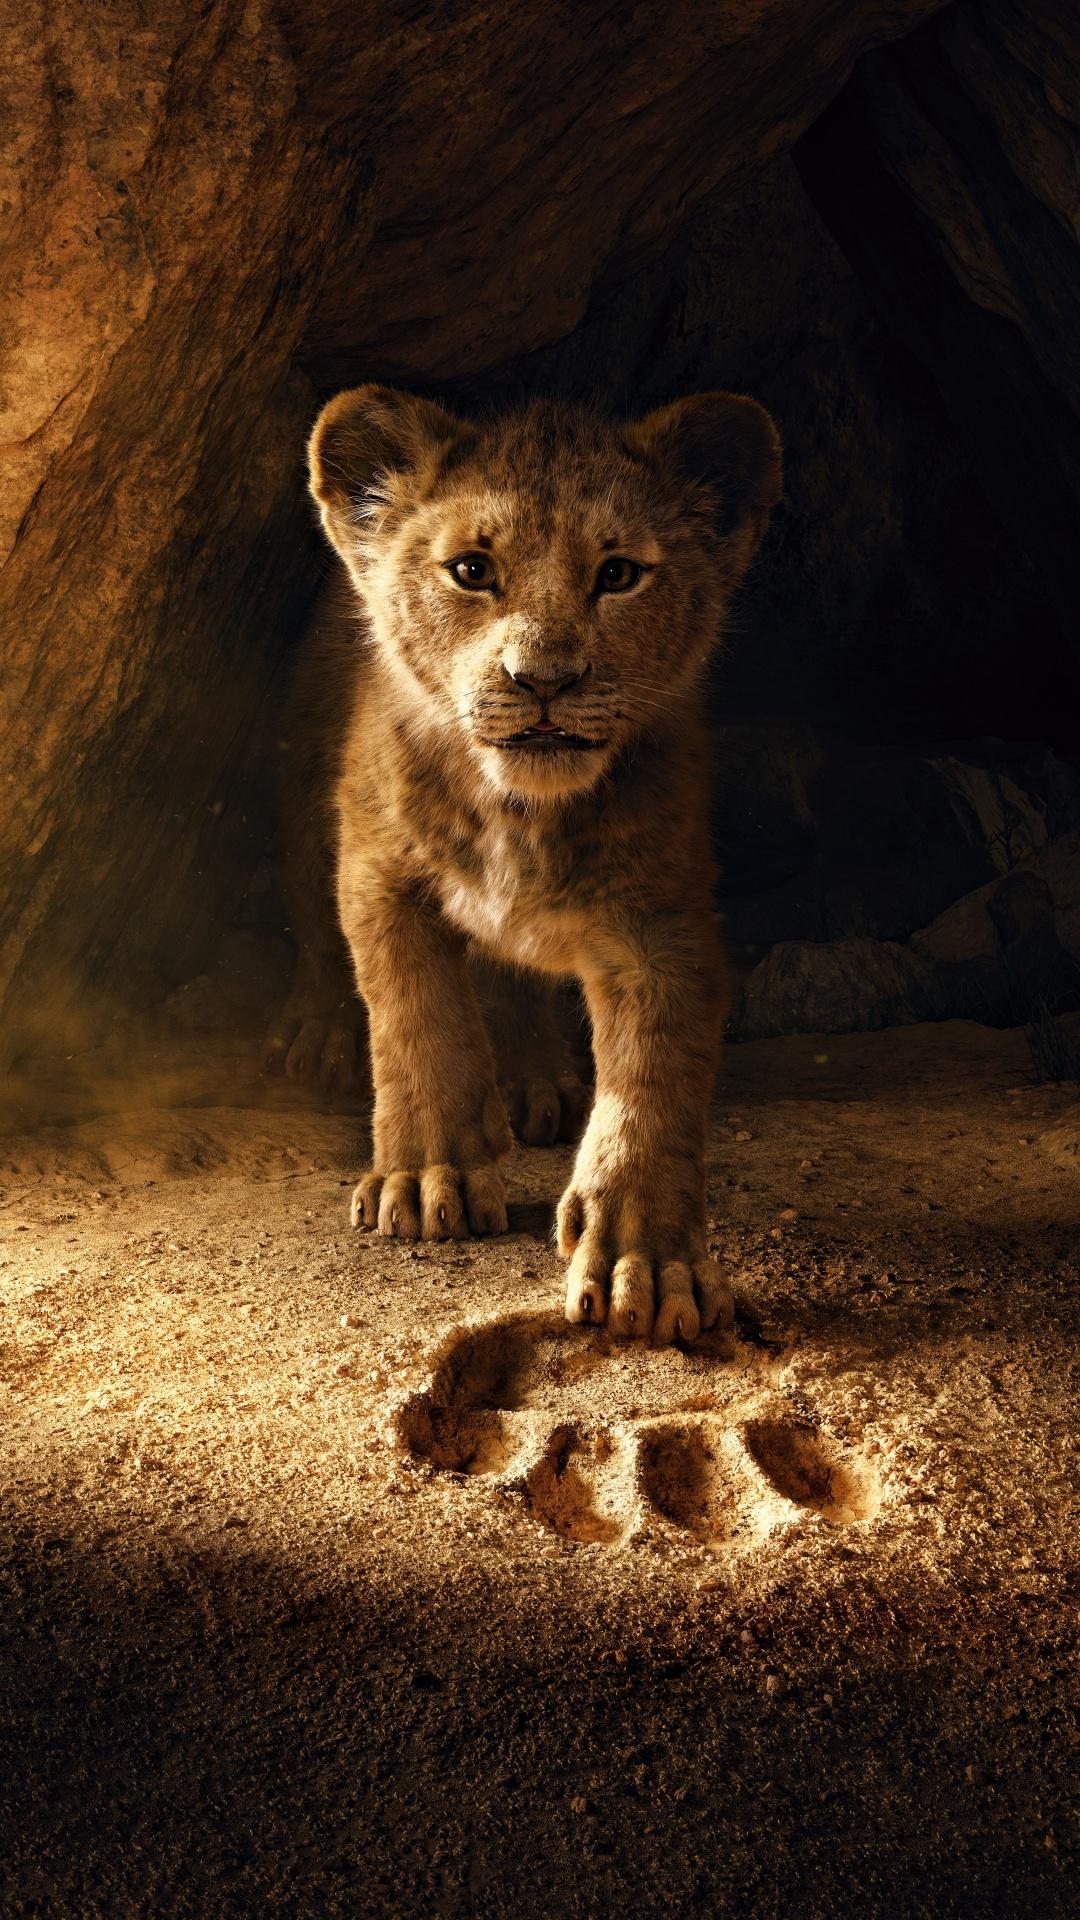 The Lion King 4K Wallpaper, Simba, Lion Cub, 5K, Movies, #944